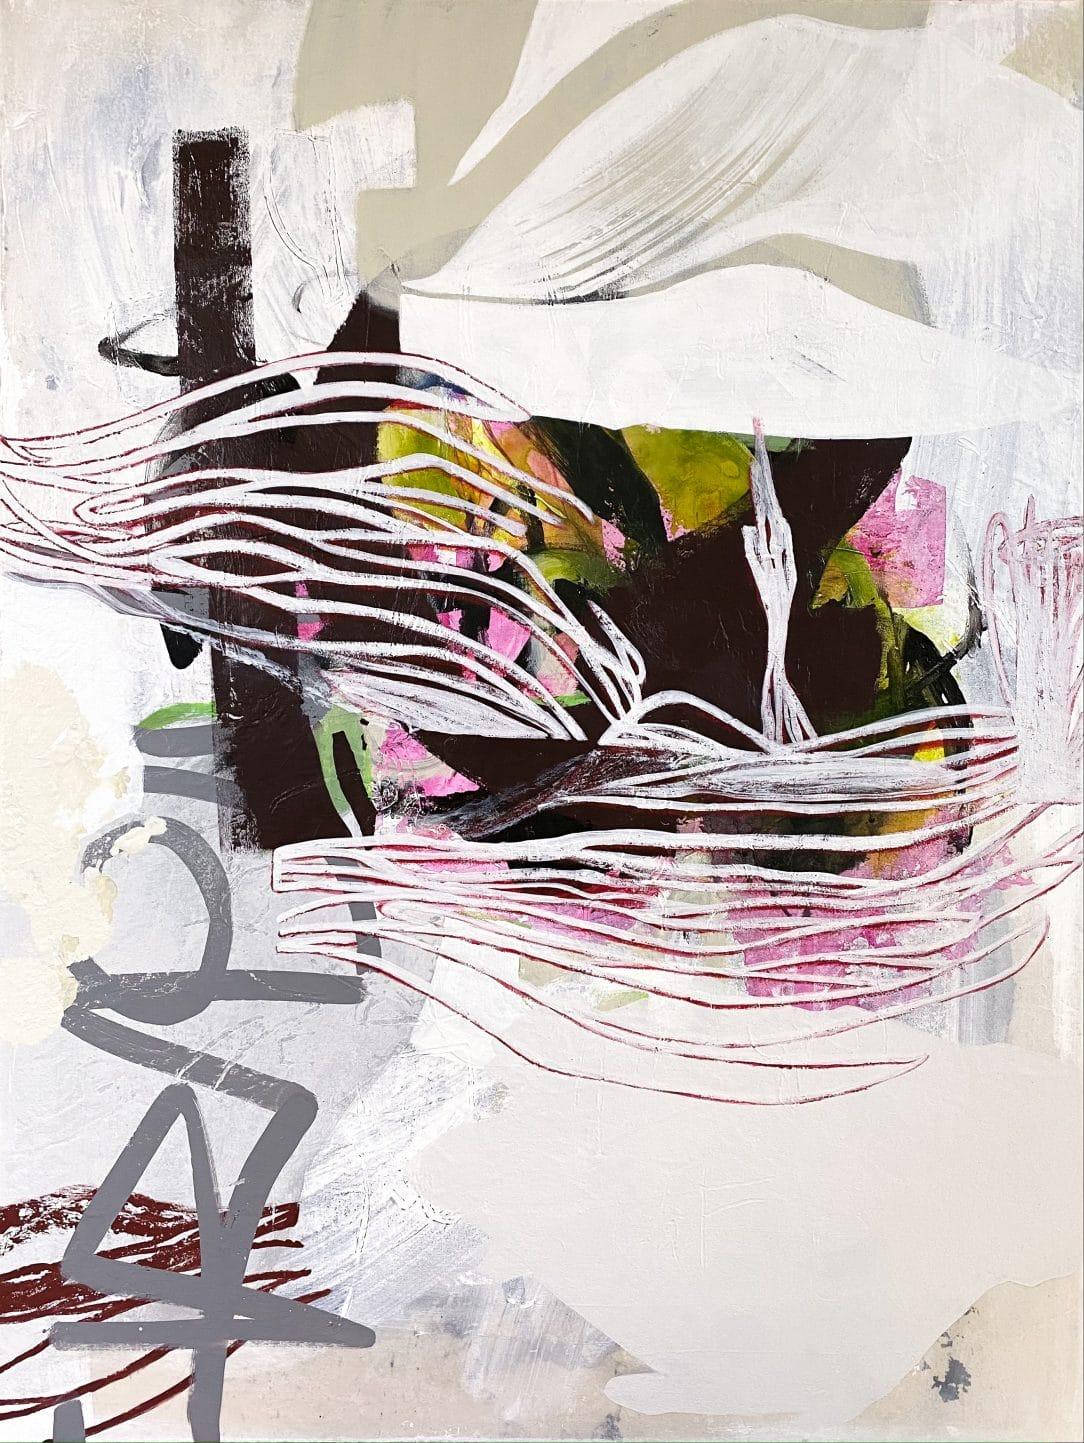 Large White Contemporary Urban Abstract Graffiti Painting Urban Edge Laura Letchinger SATURDAY